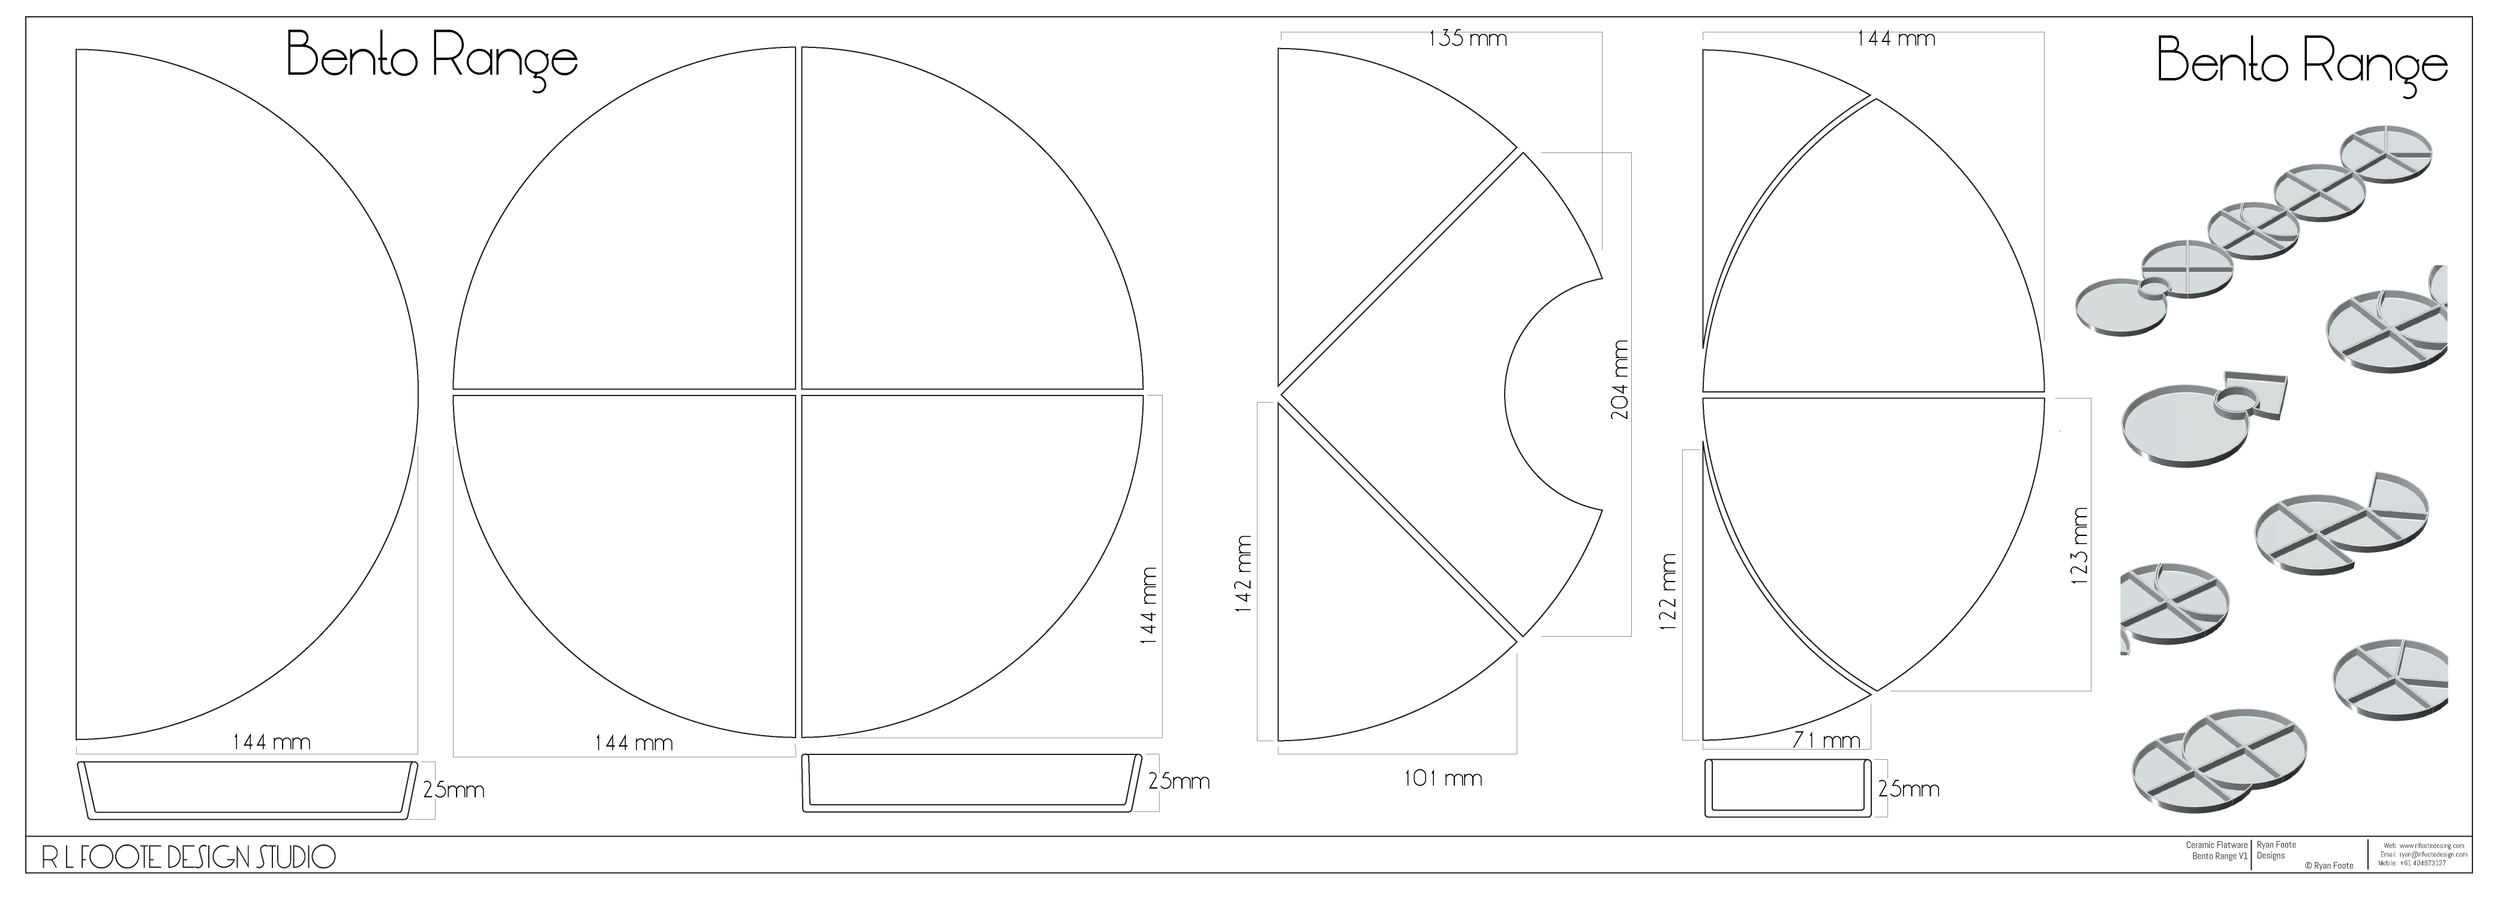 Bento sizes-01.png